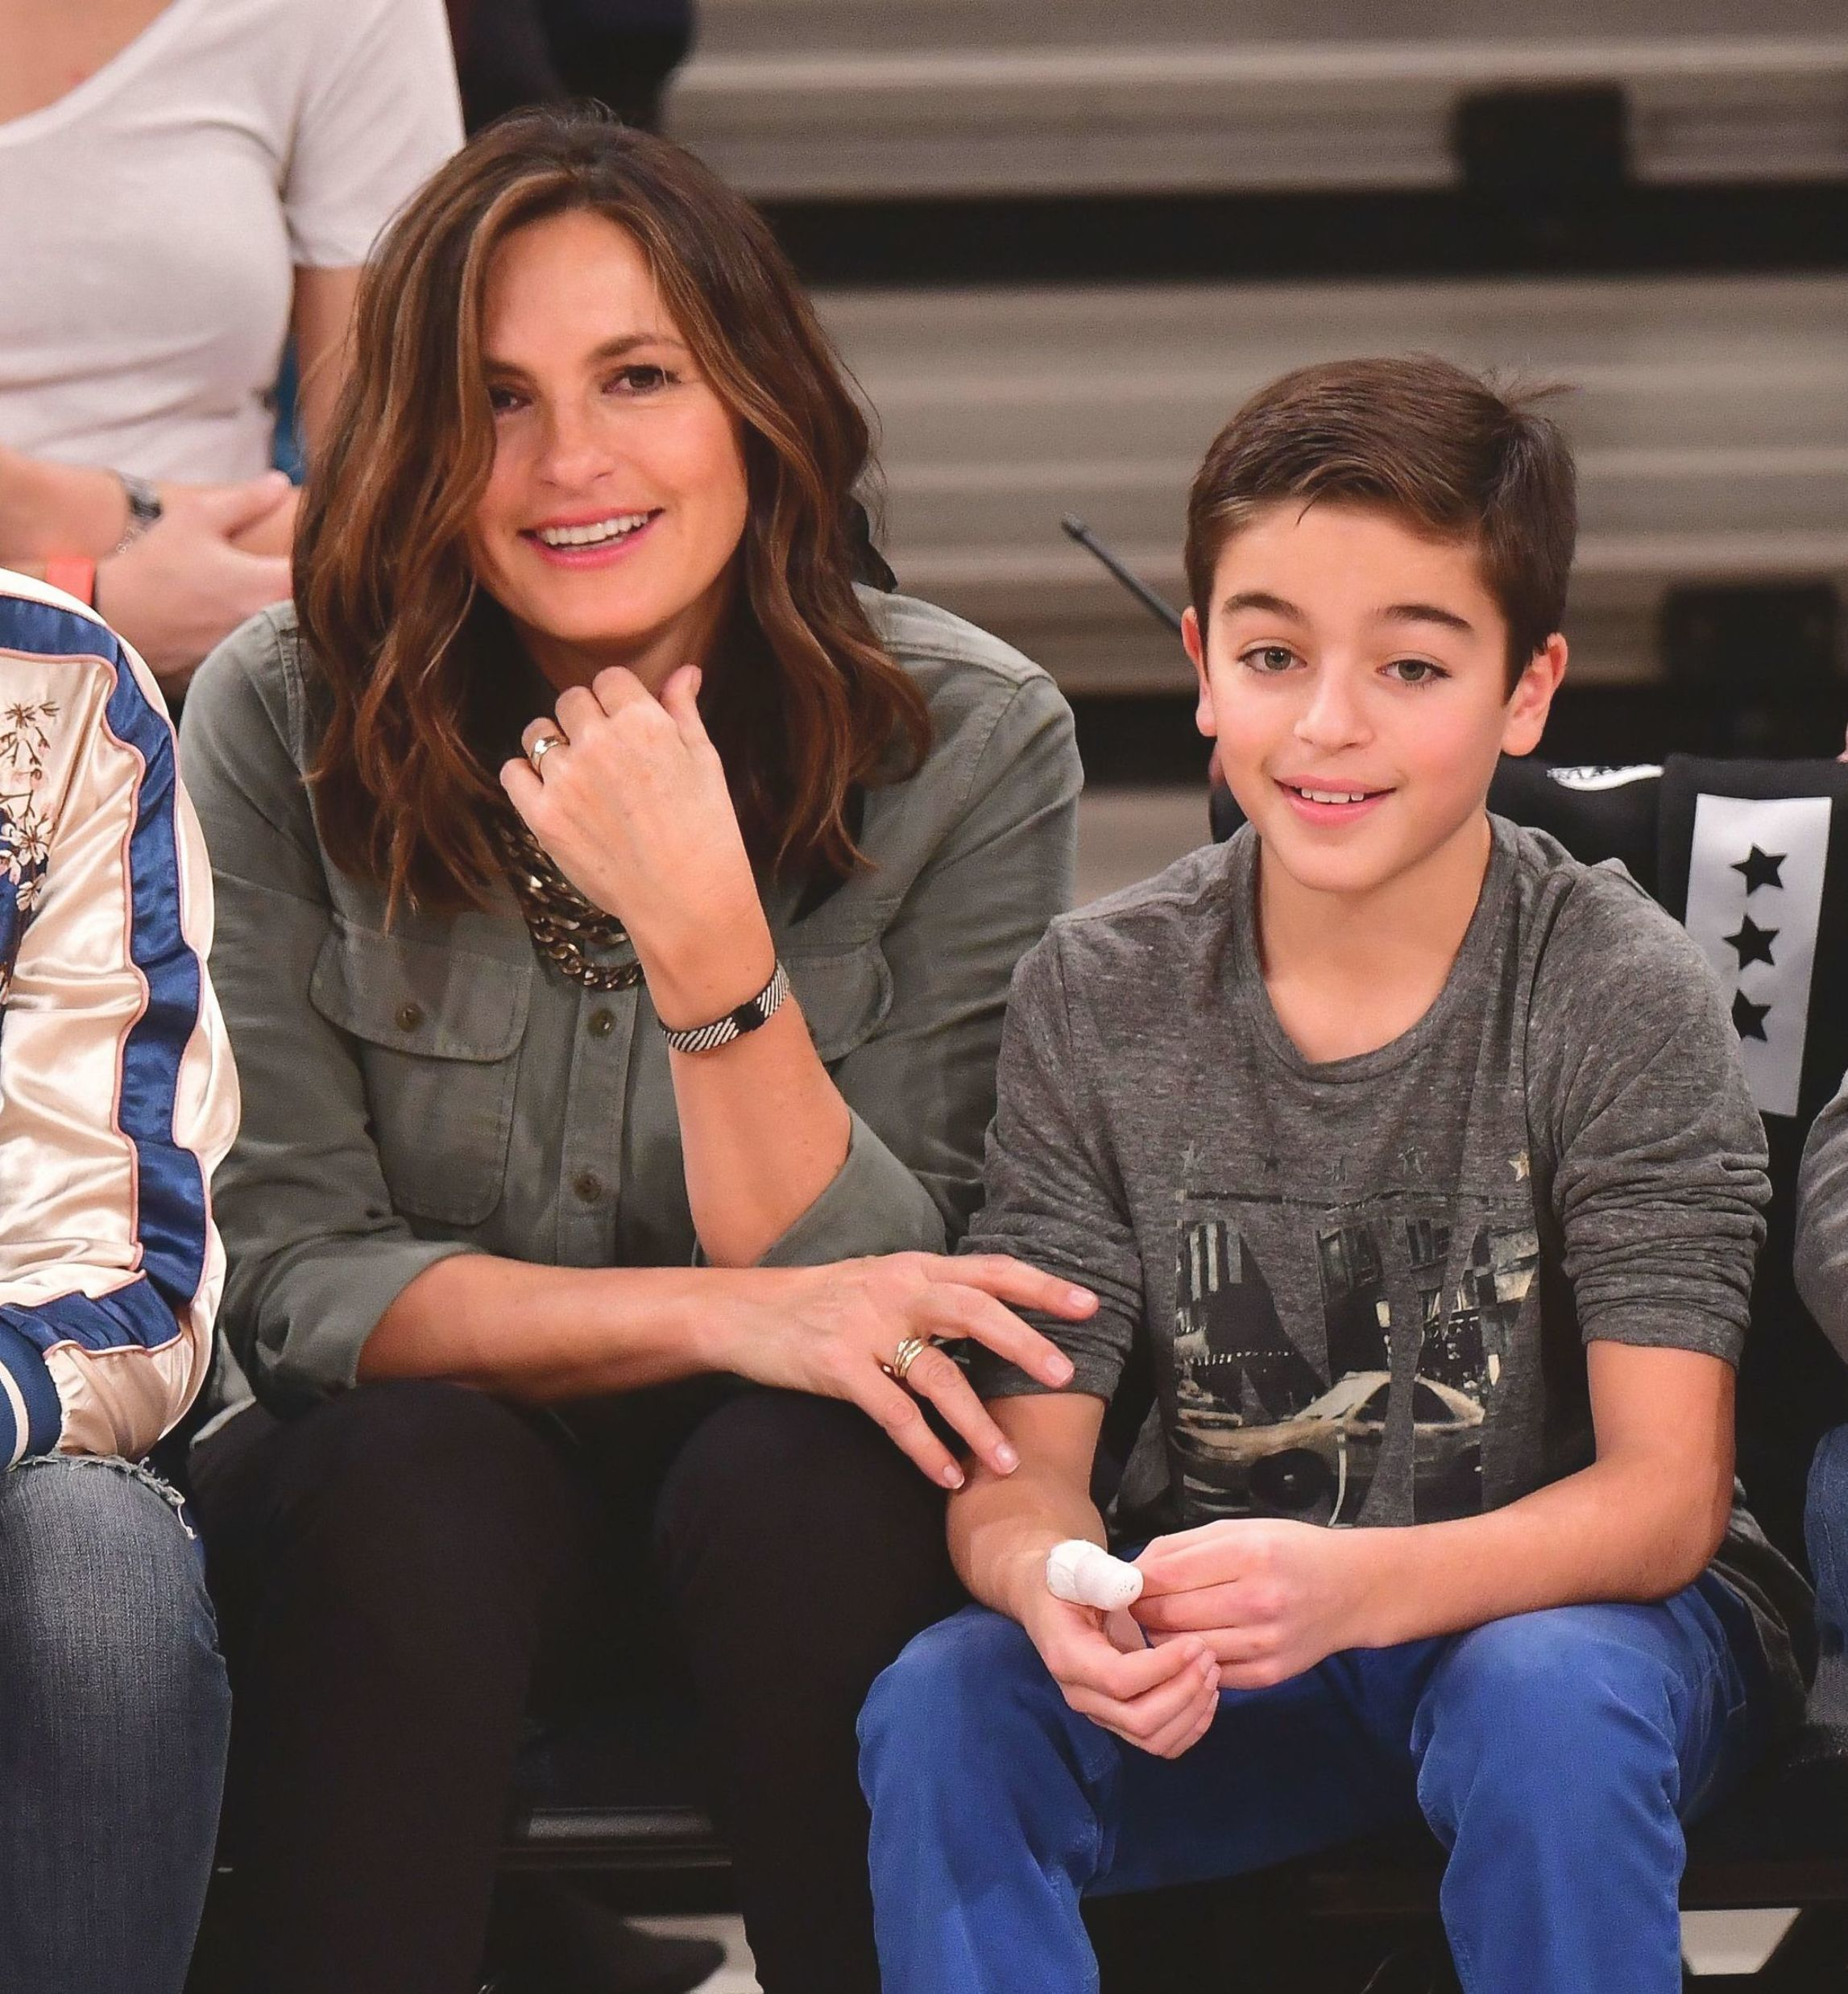 Law Order Svu Star Mariska Hargitay Stepped Out With Her Adorable Look Alike Son Celebrity Moms Mariska Hargitay Brad Pitt